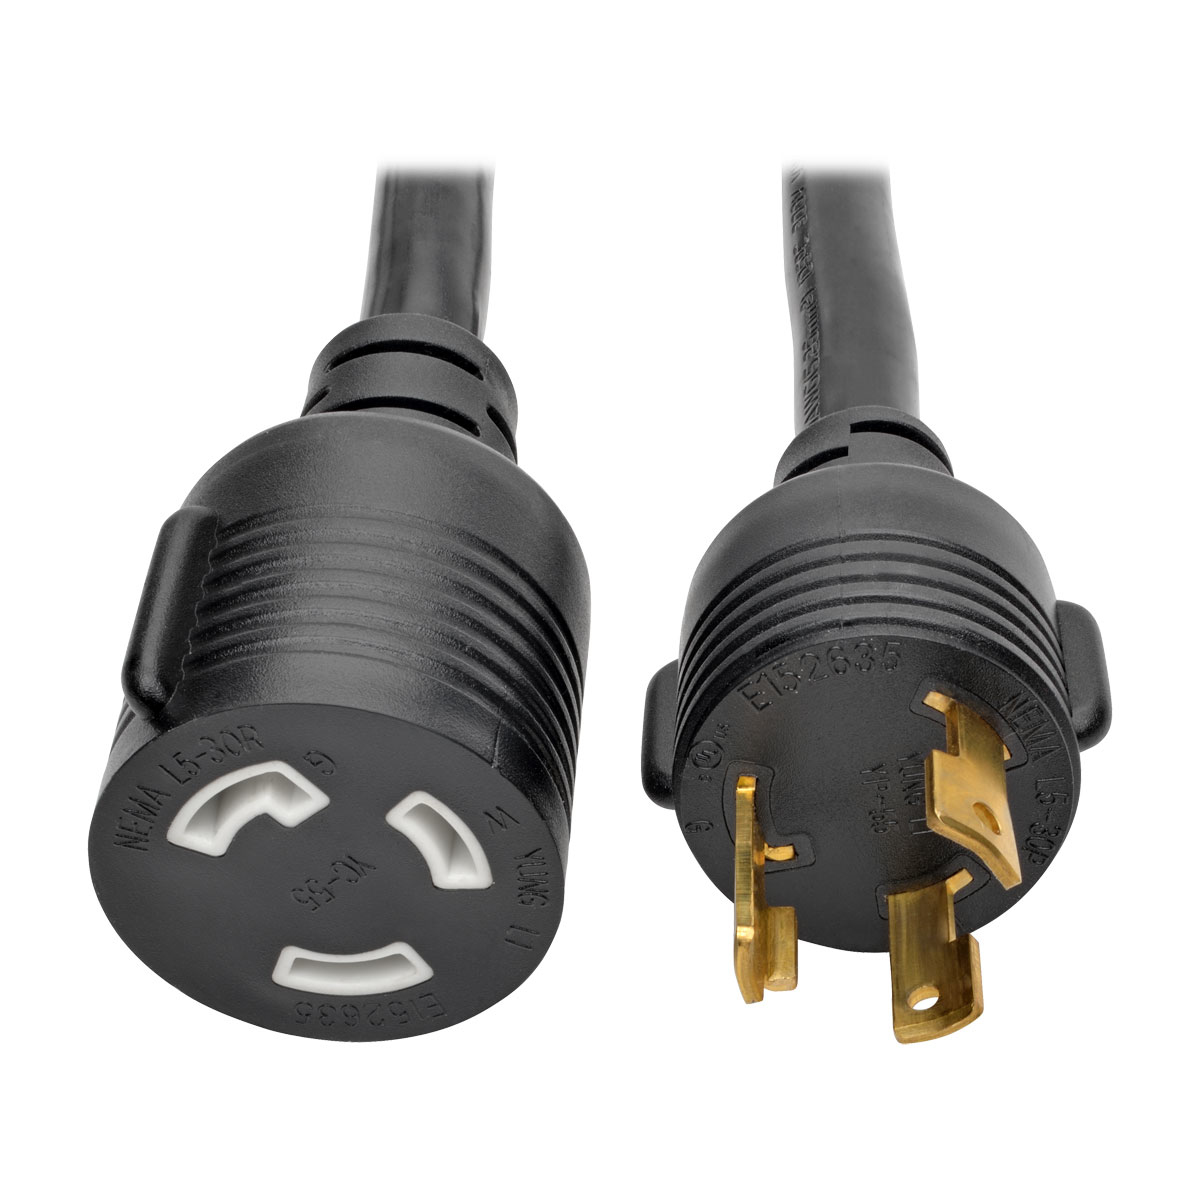 Heavy-Duty Power Extension Cord 30A 10 AWG (NEMA L5-30P to NEMA L5-30R)  Locking Connectors 15 ft. - Power extension cable - NEMA L5-30 (P) to NEMA L5-30 - 125 V - 30 A - 15 ft - molded - black